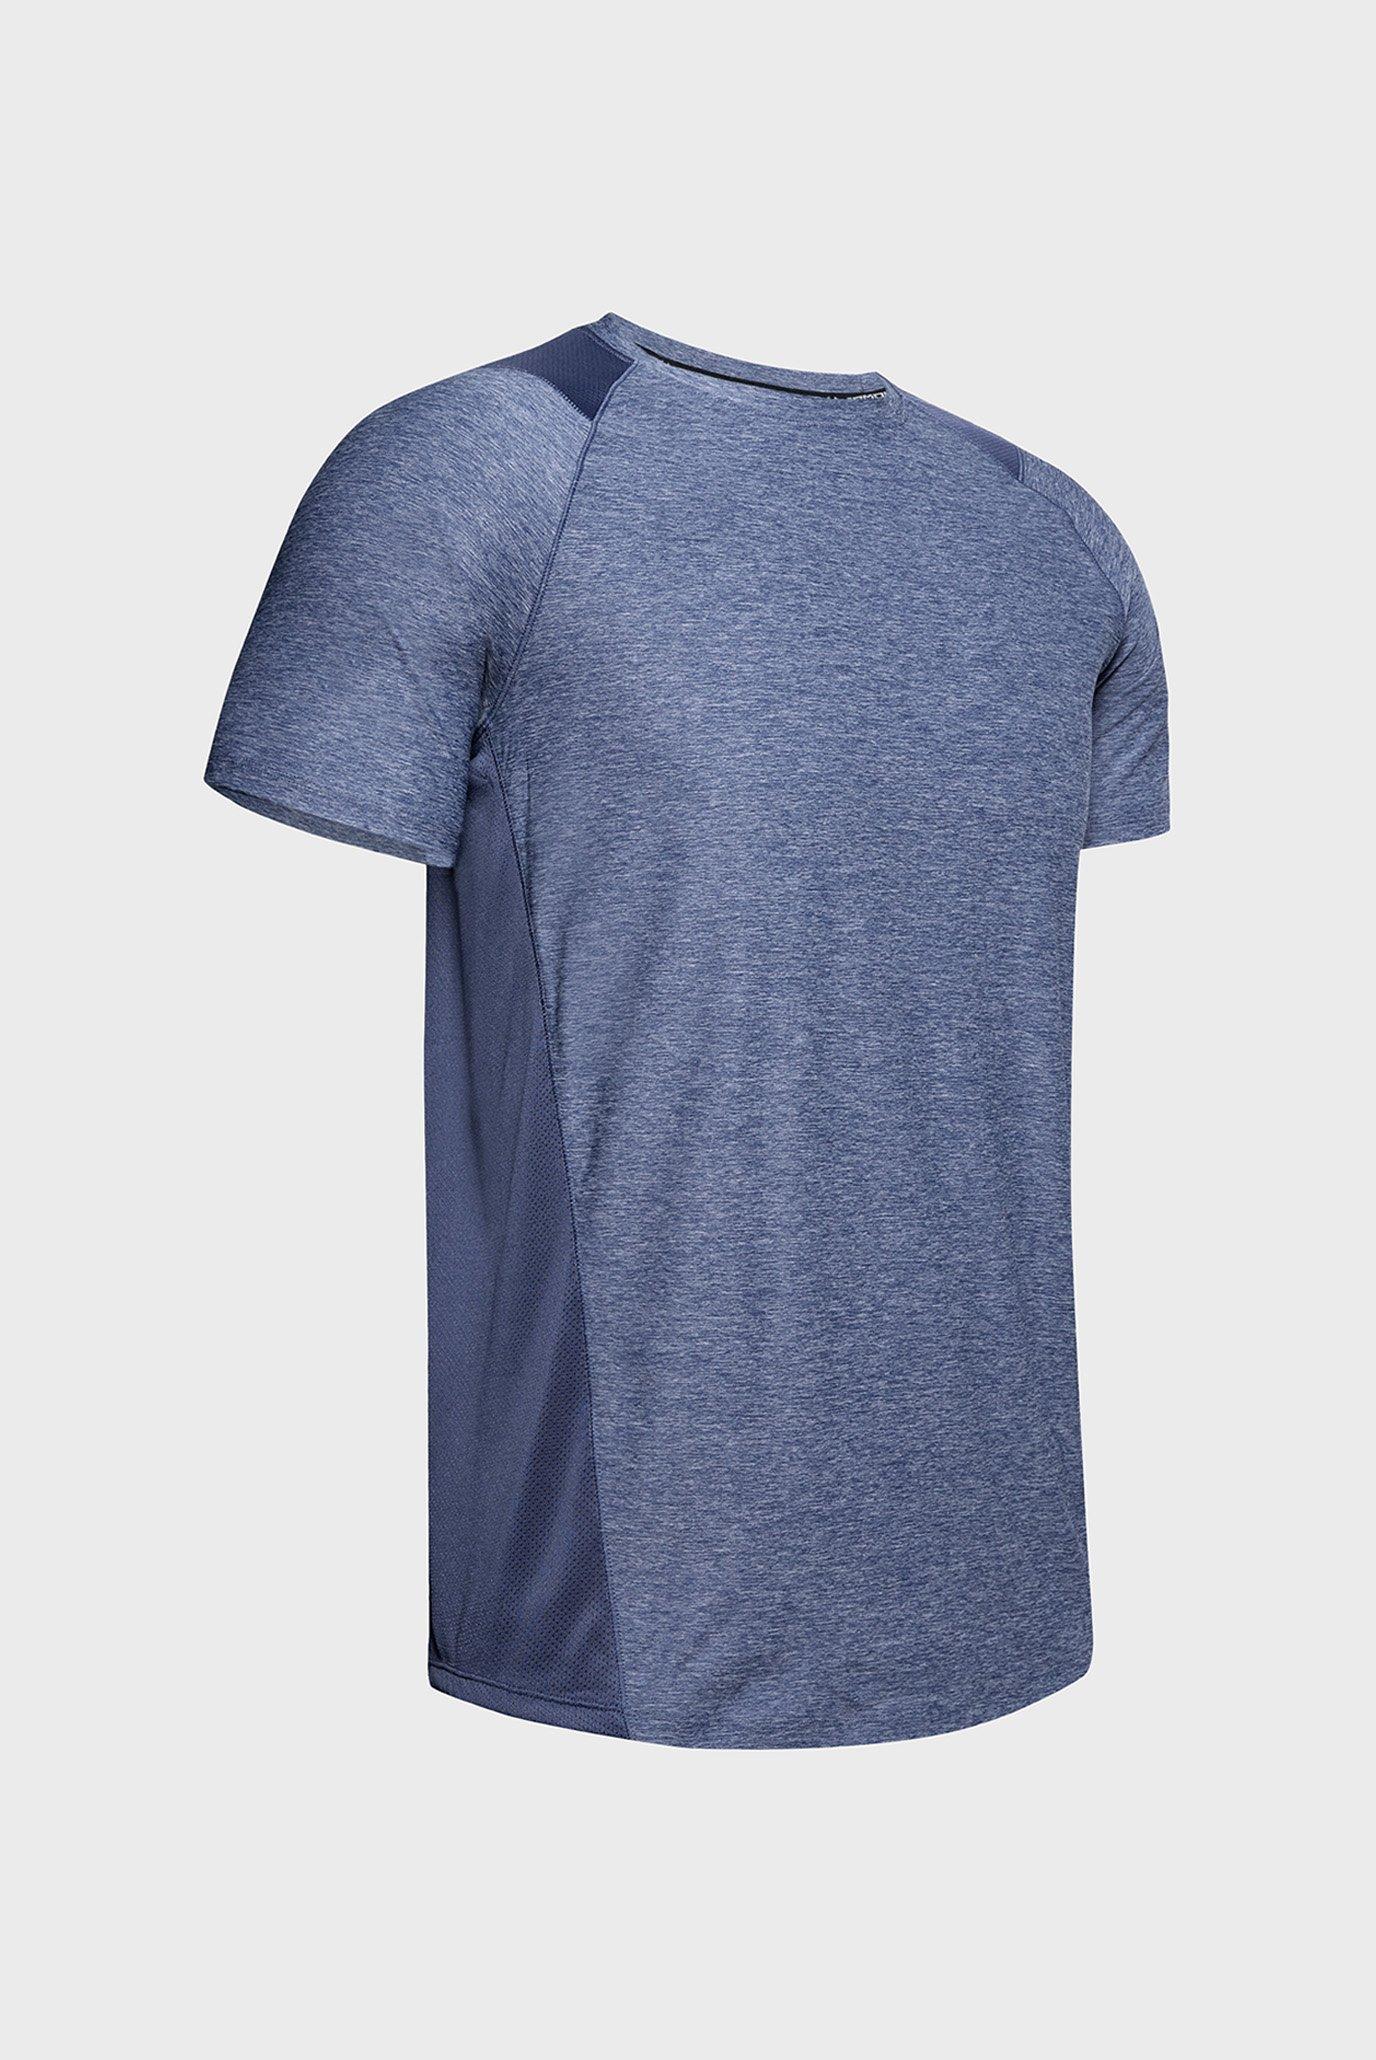 Мужская синяя футболка MK1 SS Under Armour